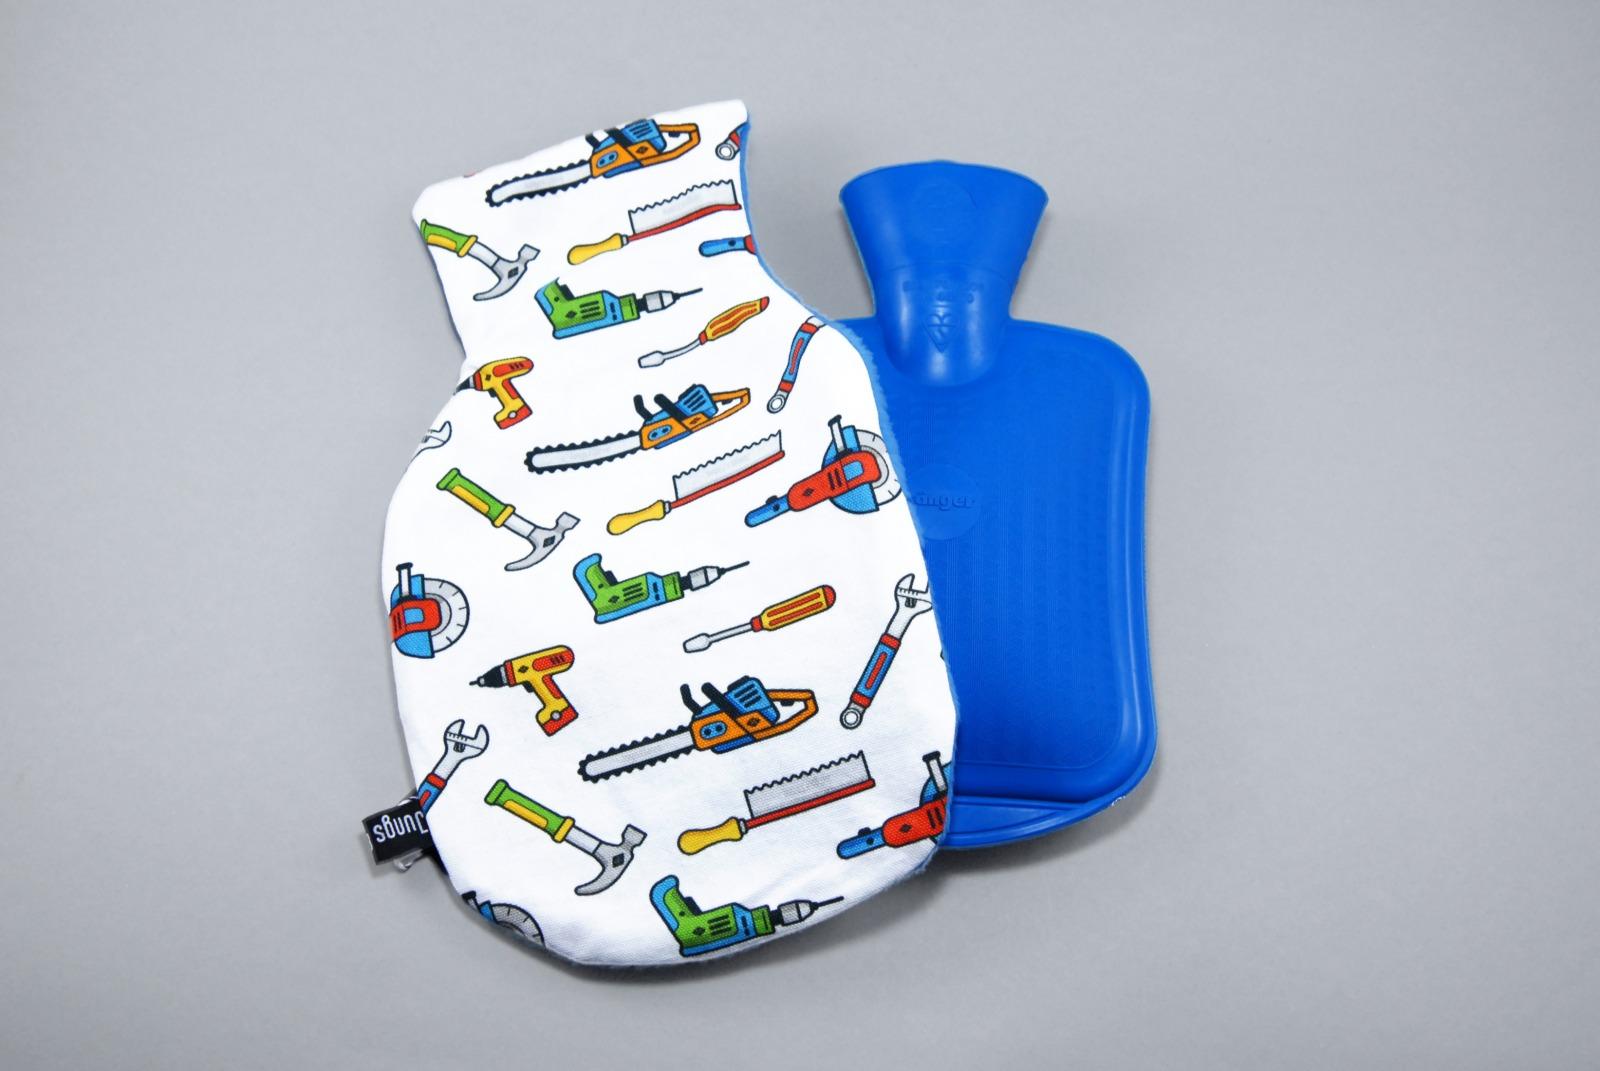 Waermflasche Werkzeuge